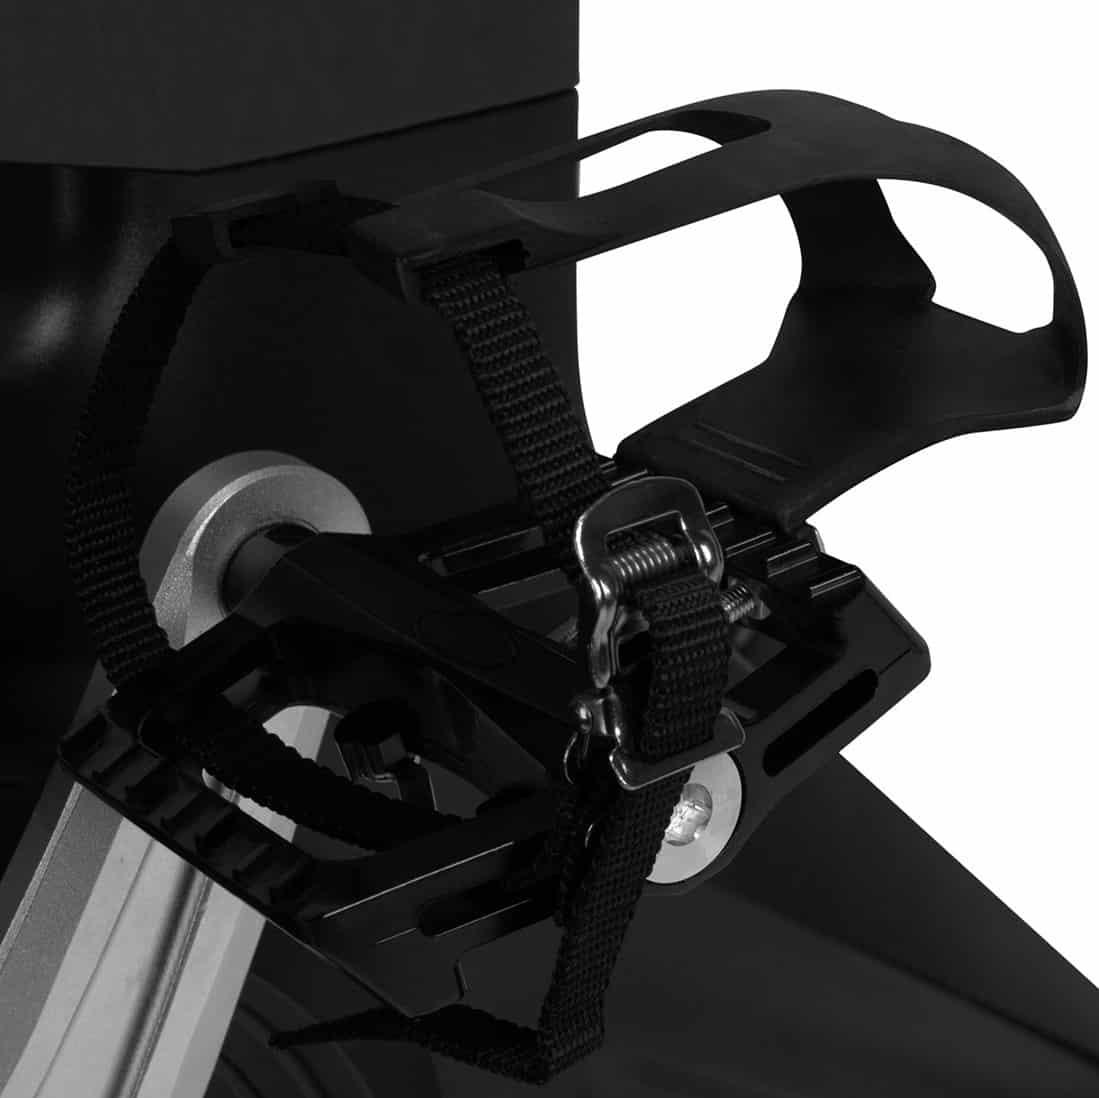 virtufit-indoor-cycle-s1-spinningfiets-pedaal